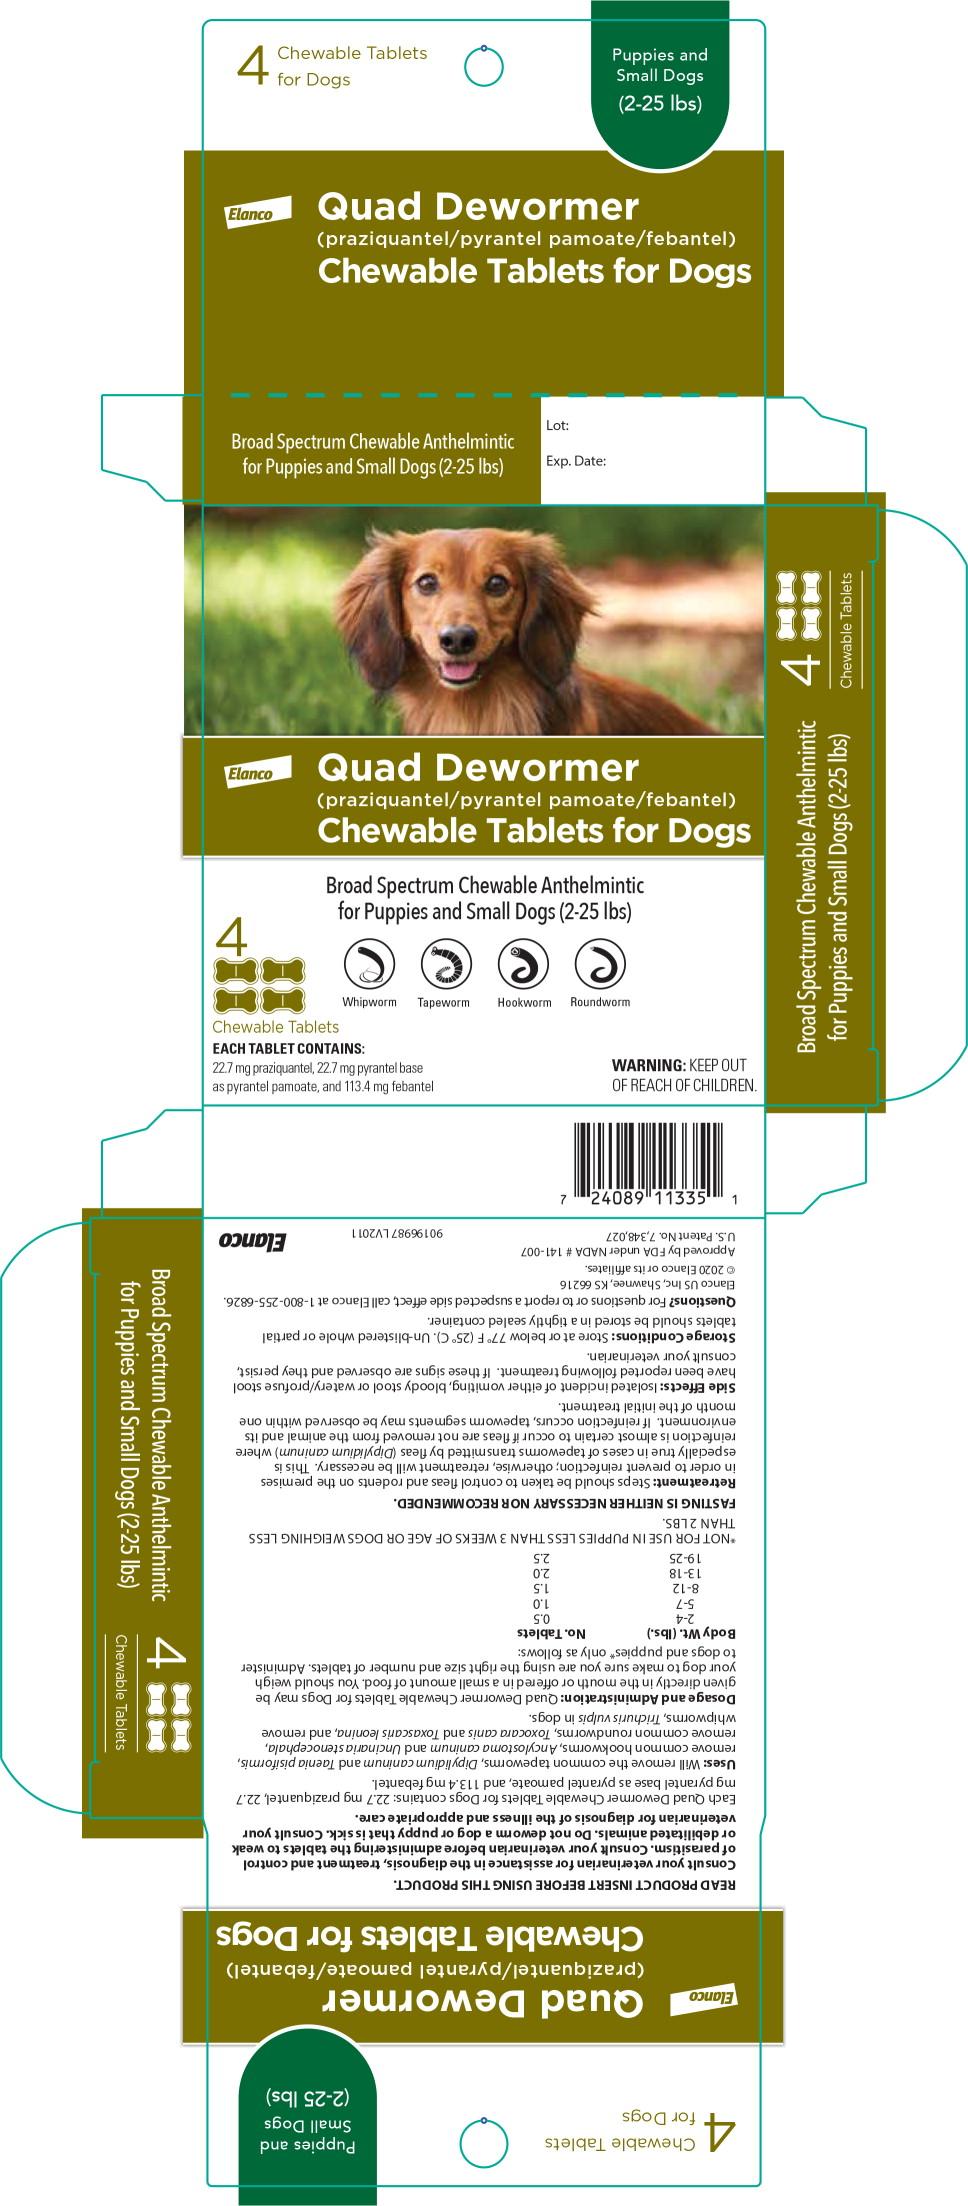 Principal Display Panel – Puppies and Small Dogs Carton Label